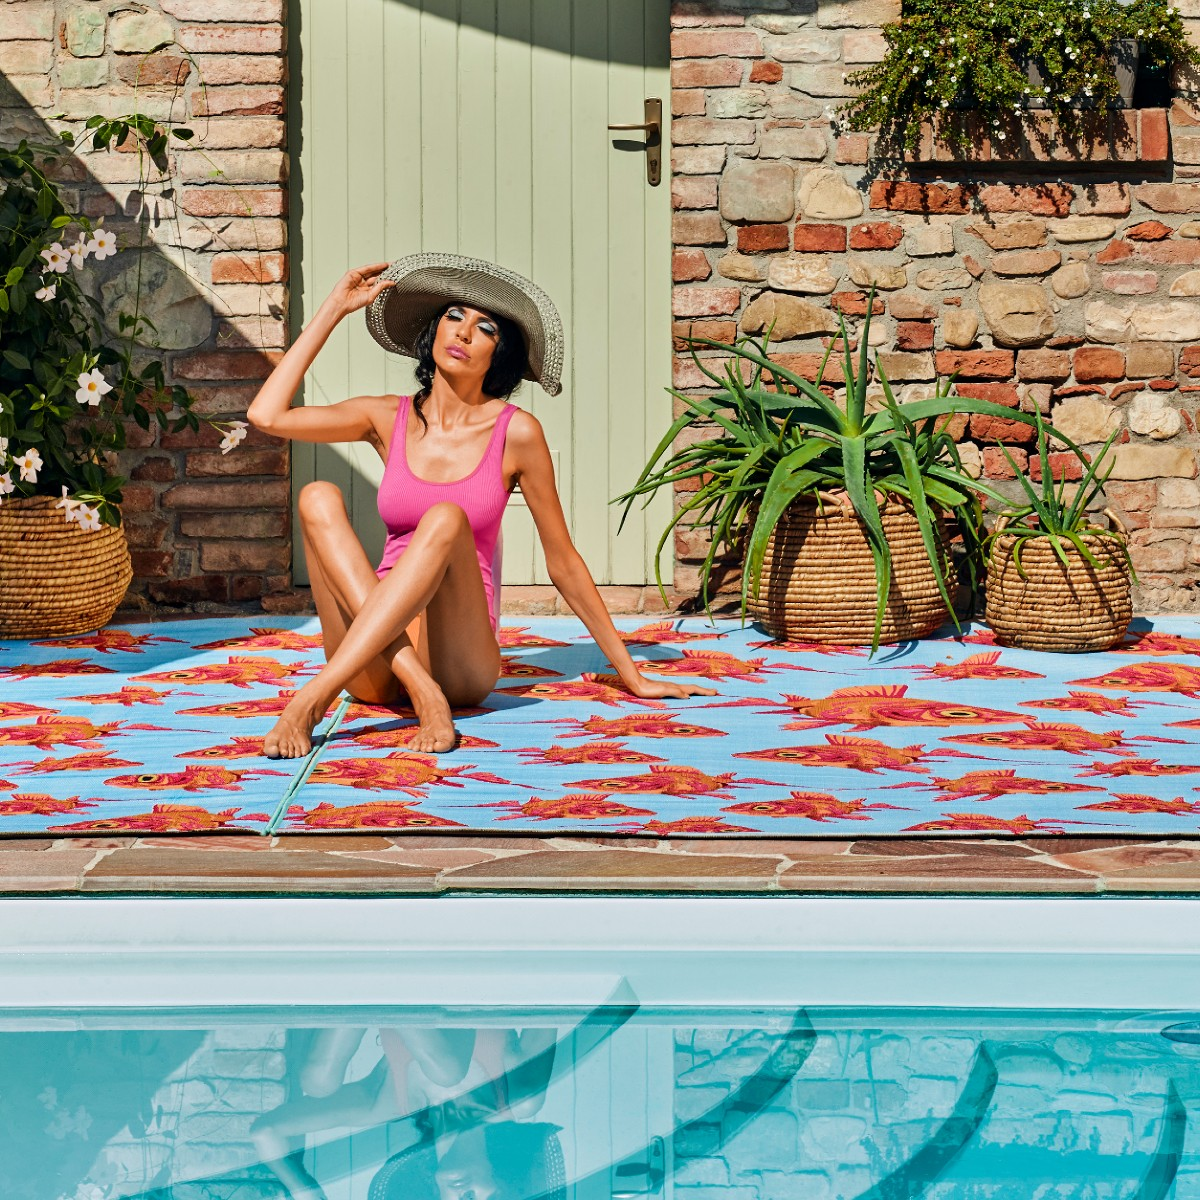 Sitap Carpet Couture Italia-Vacanze a Taormina #SitapEstateItaliana-01